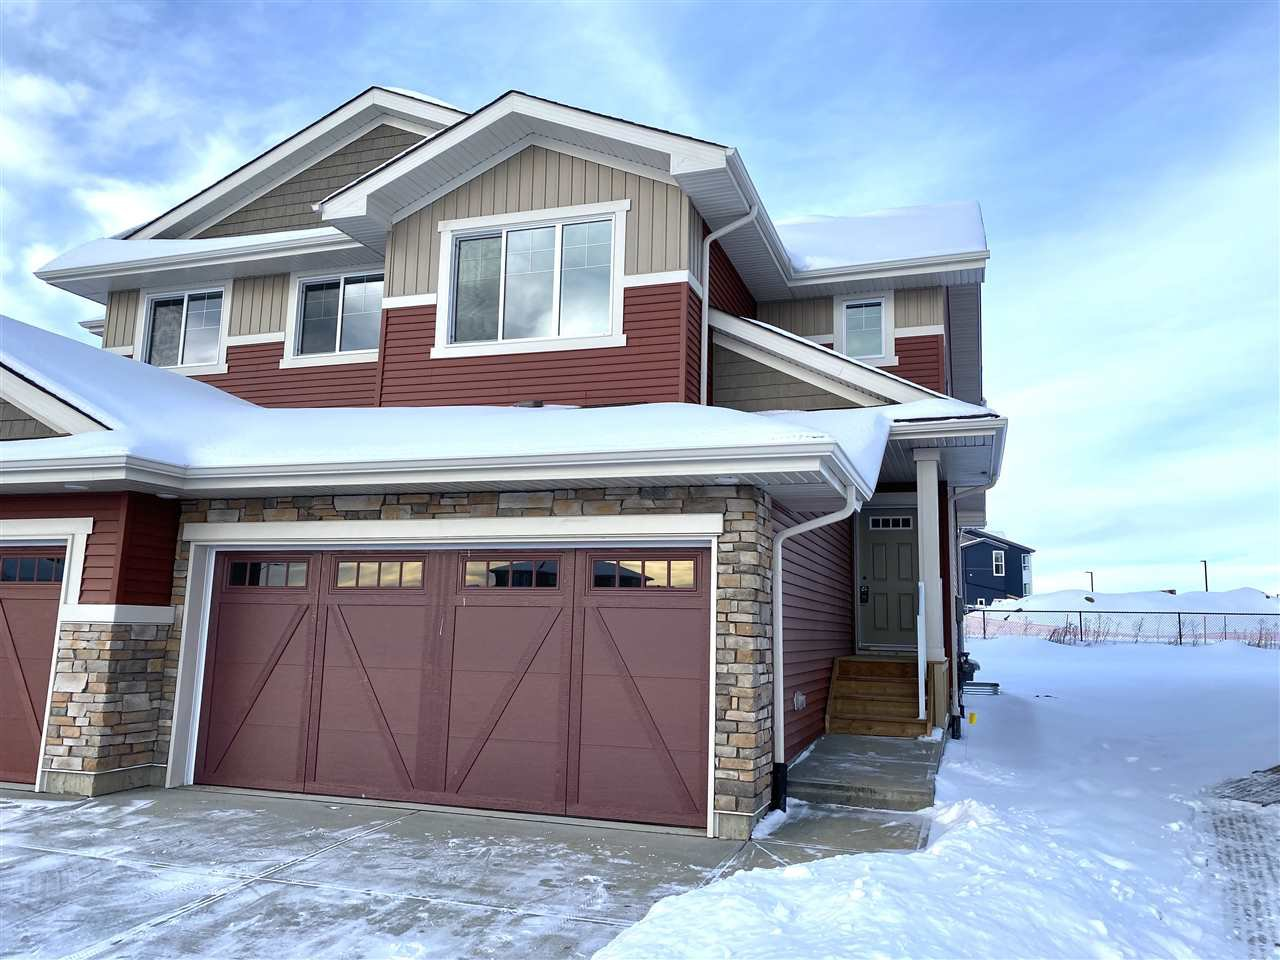 Main Photo: 30 JUNEAU Way: St. Albert House Half Duplex for sale : MLS®# E4185074